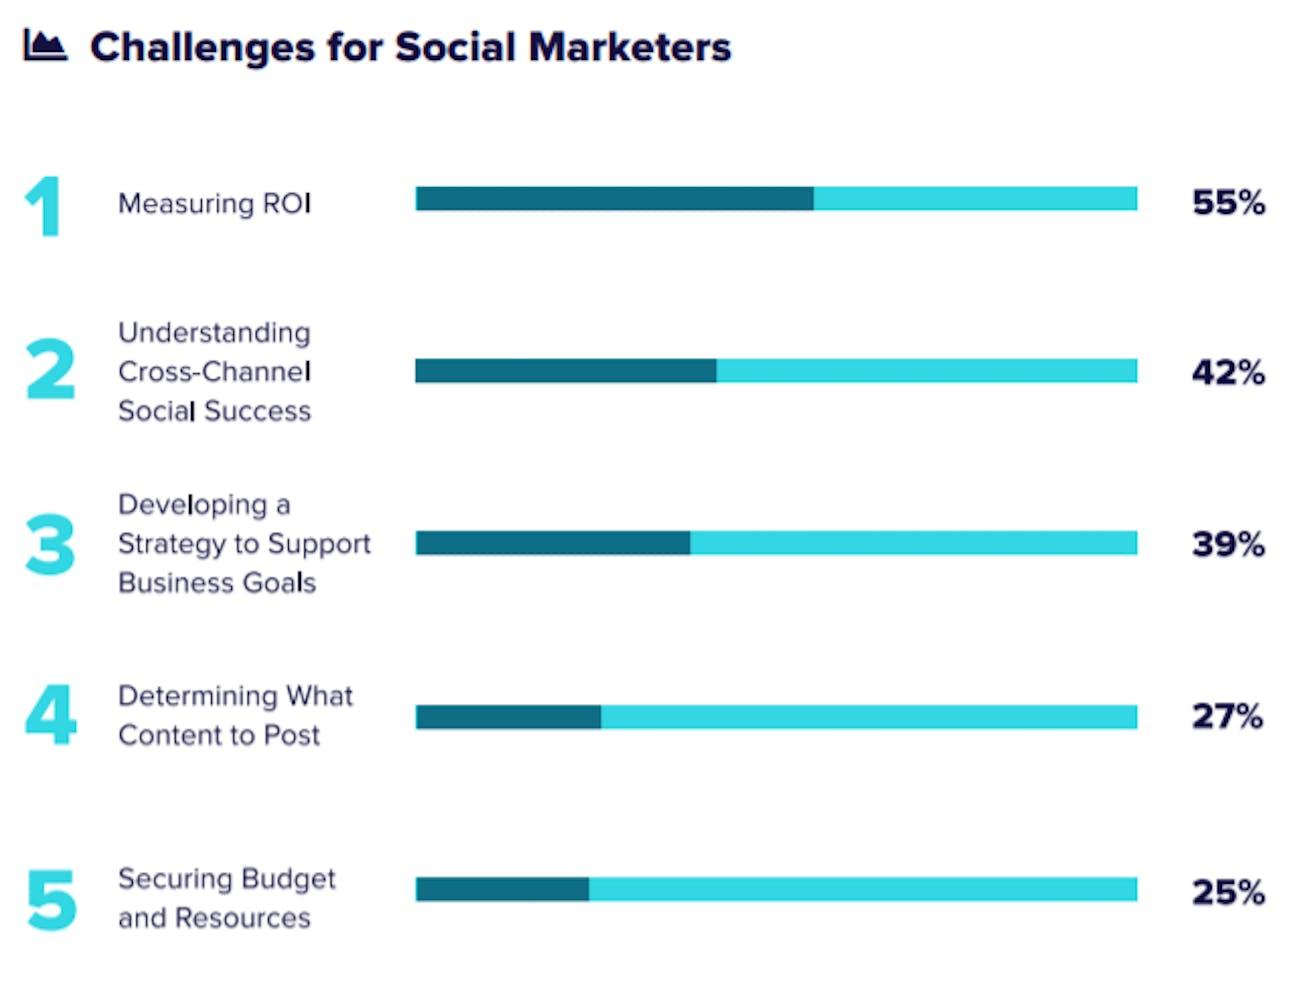 challenges des social marketers